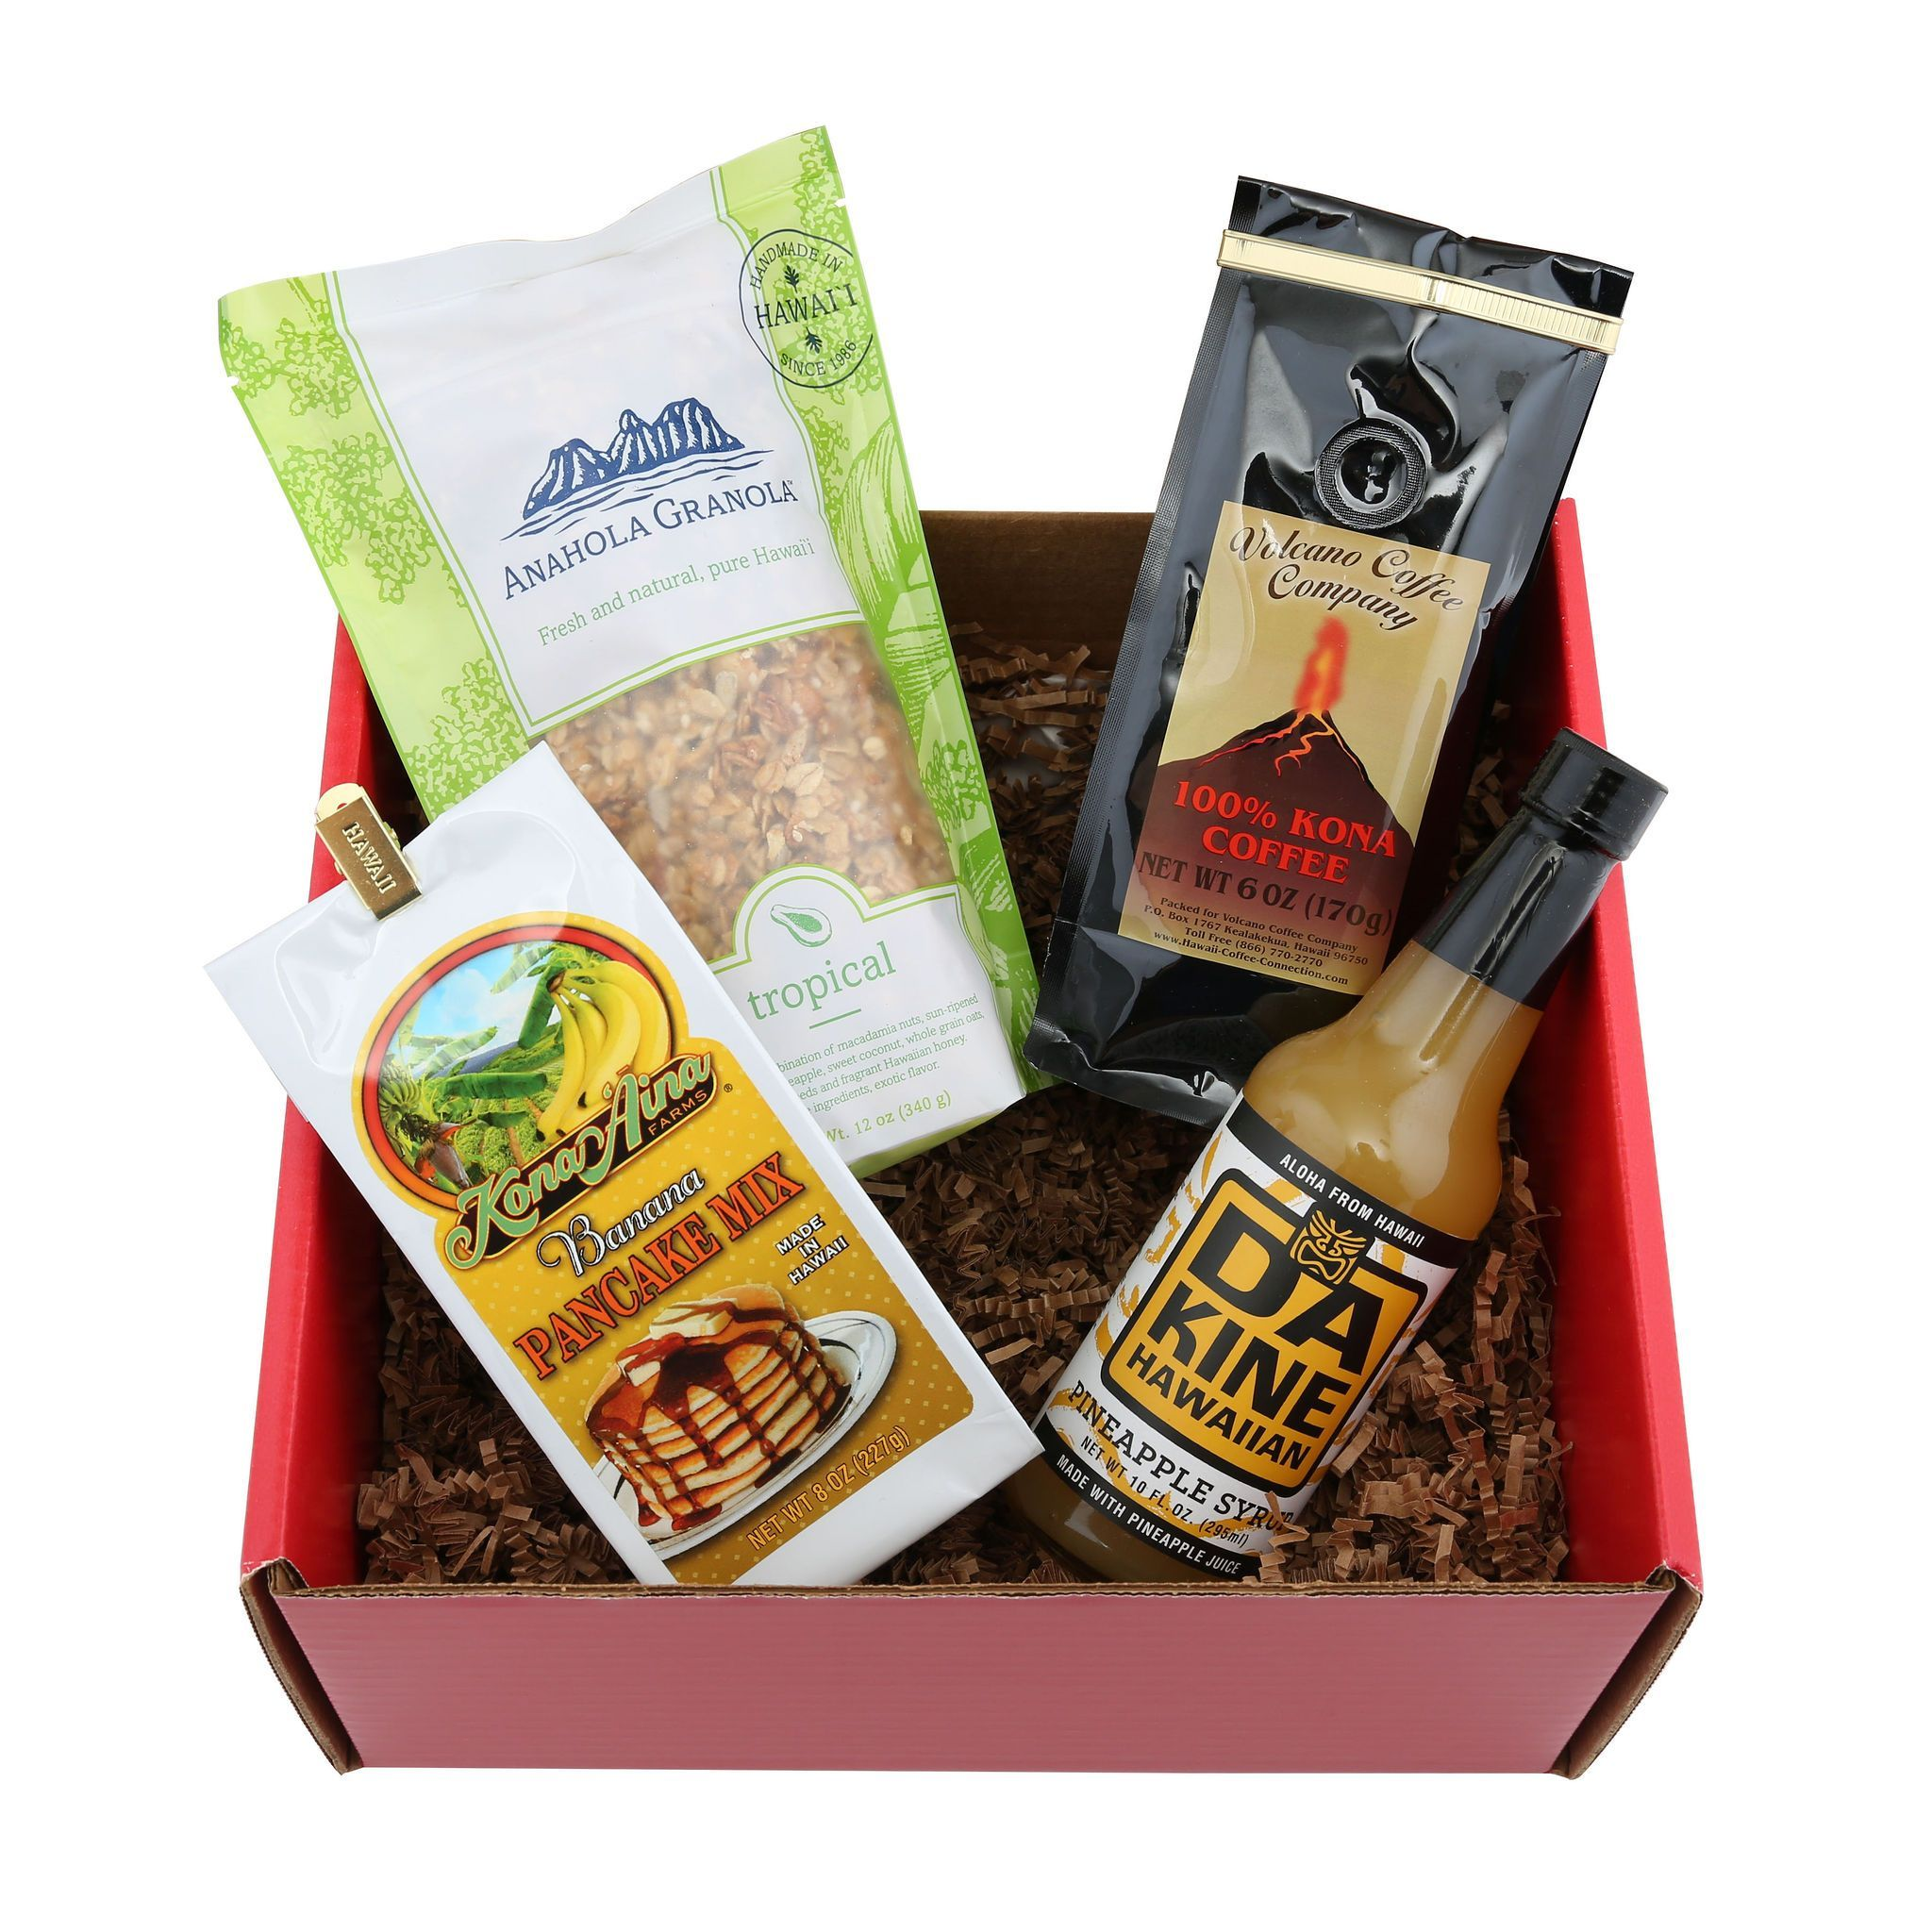 Taste of Aloha Island Breakfast Gift Box Breakfast